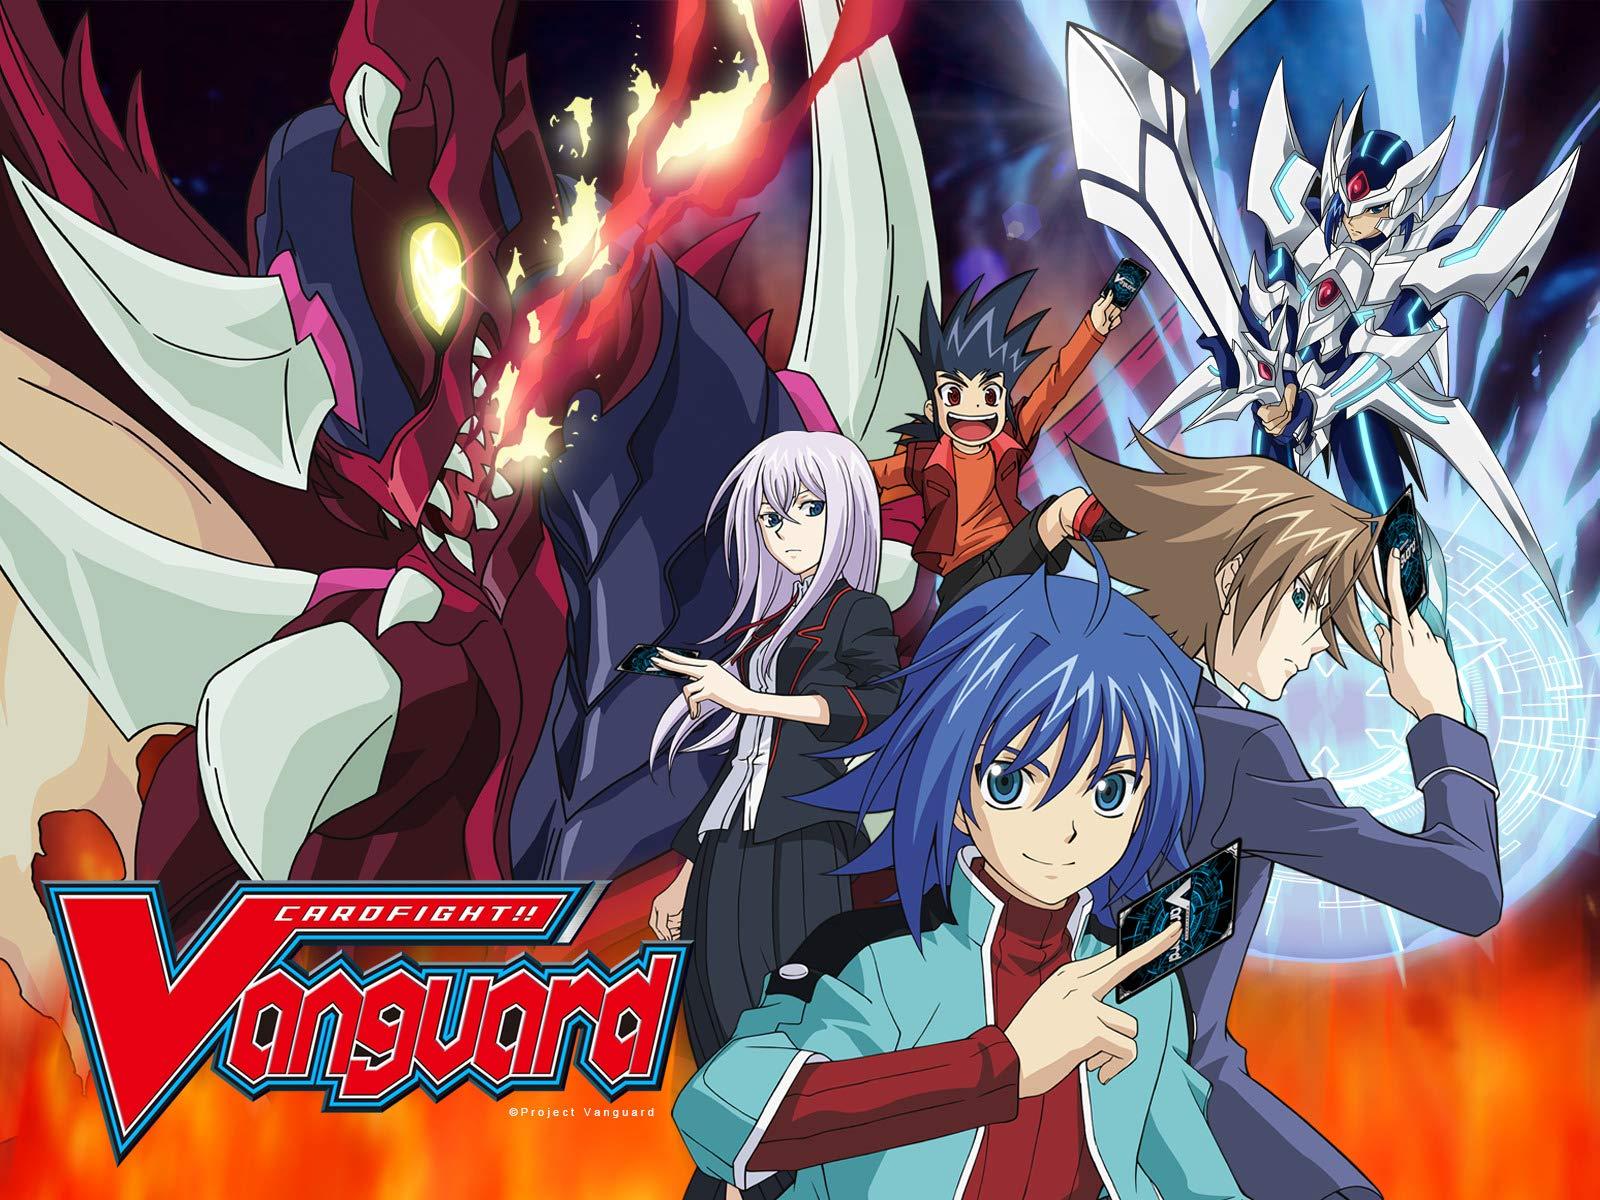 CARDFIGHT!! Vanguard - Season 1